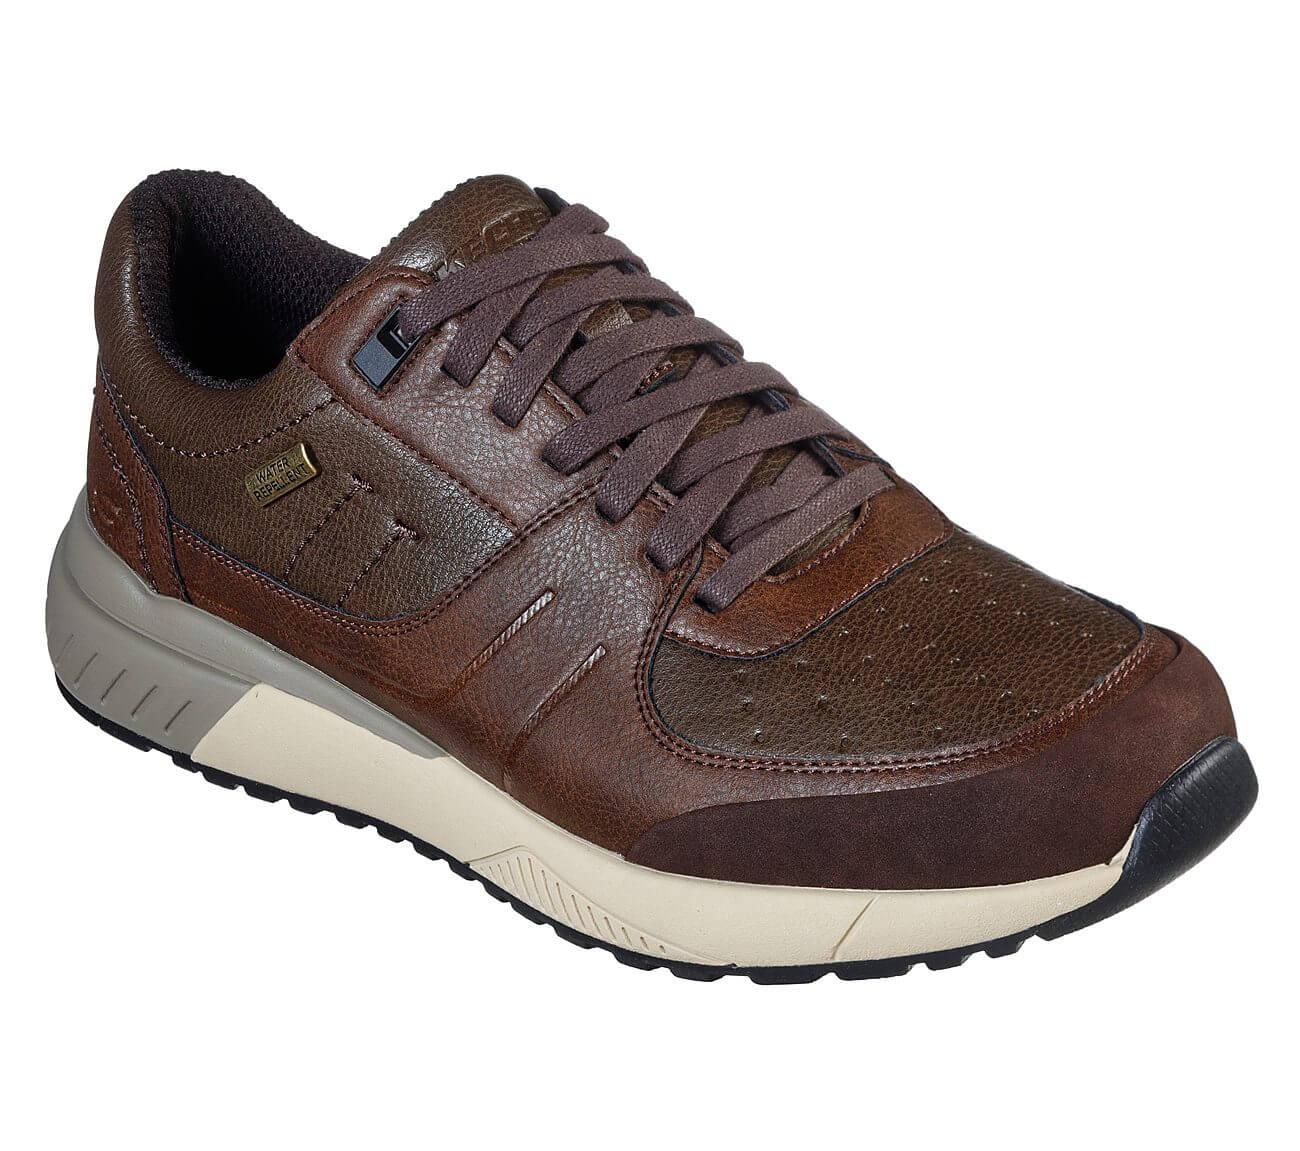 Skechers Felano brown